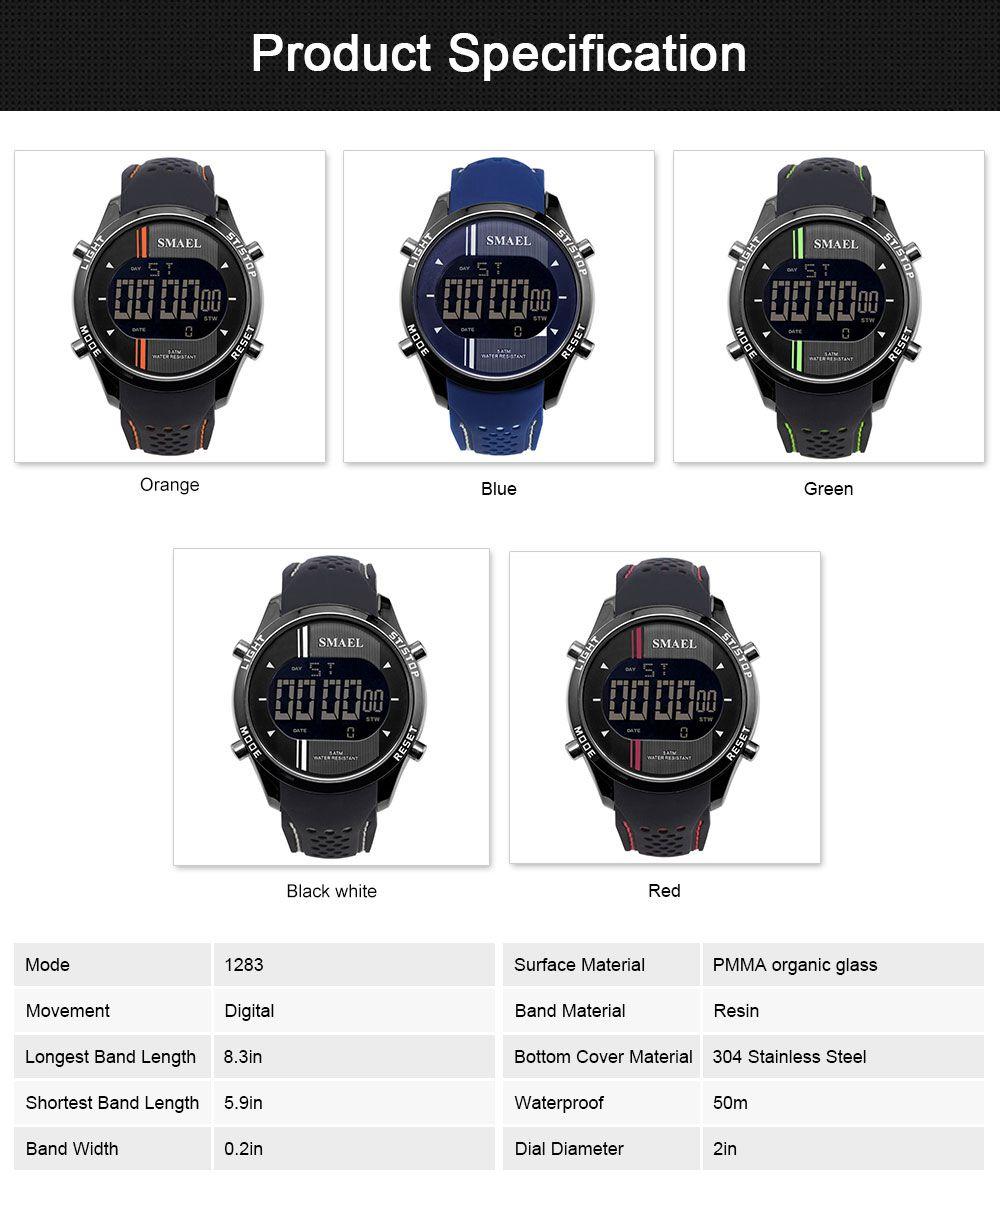 Digital Sport Watch for Men, Multifunctional Smartwatch 50M Waterproof Outdoors Watch 6